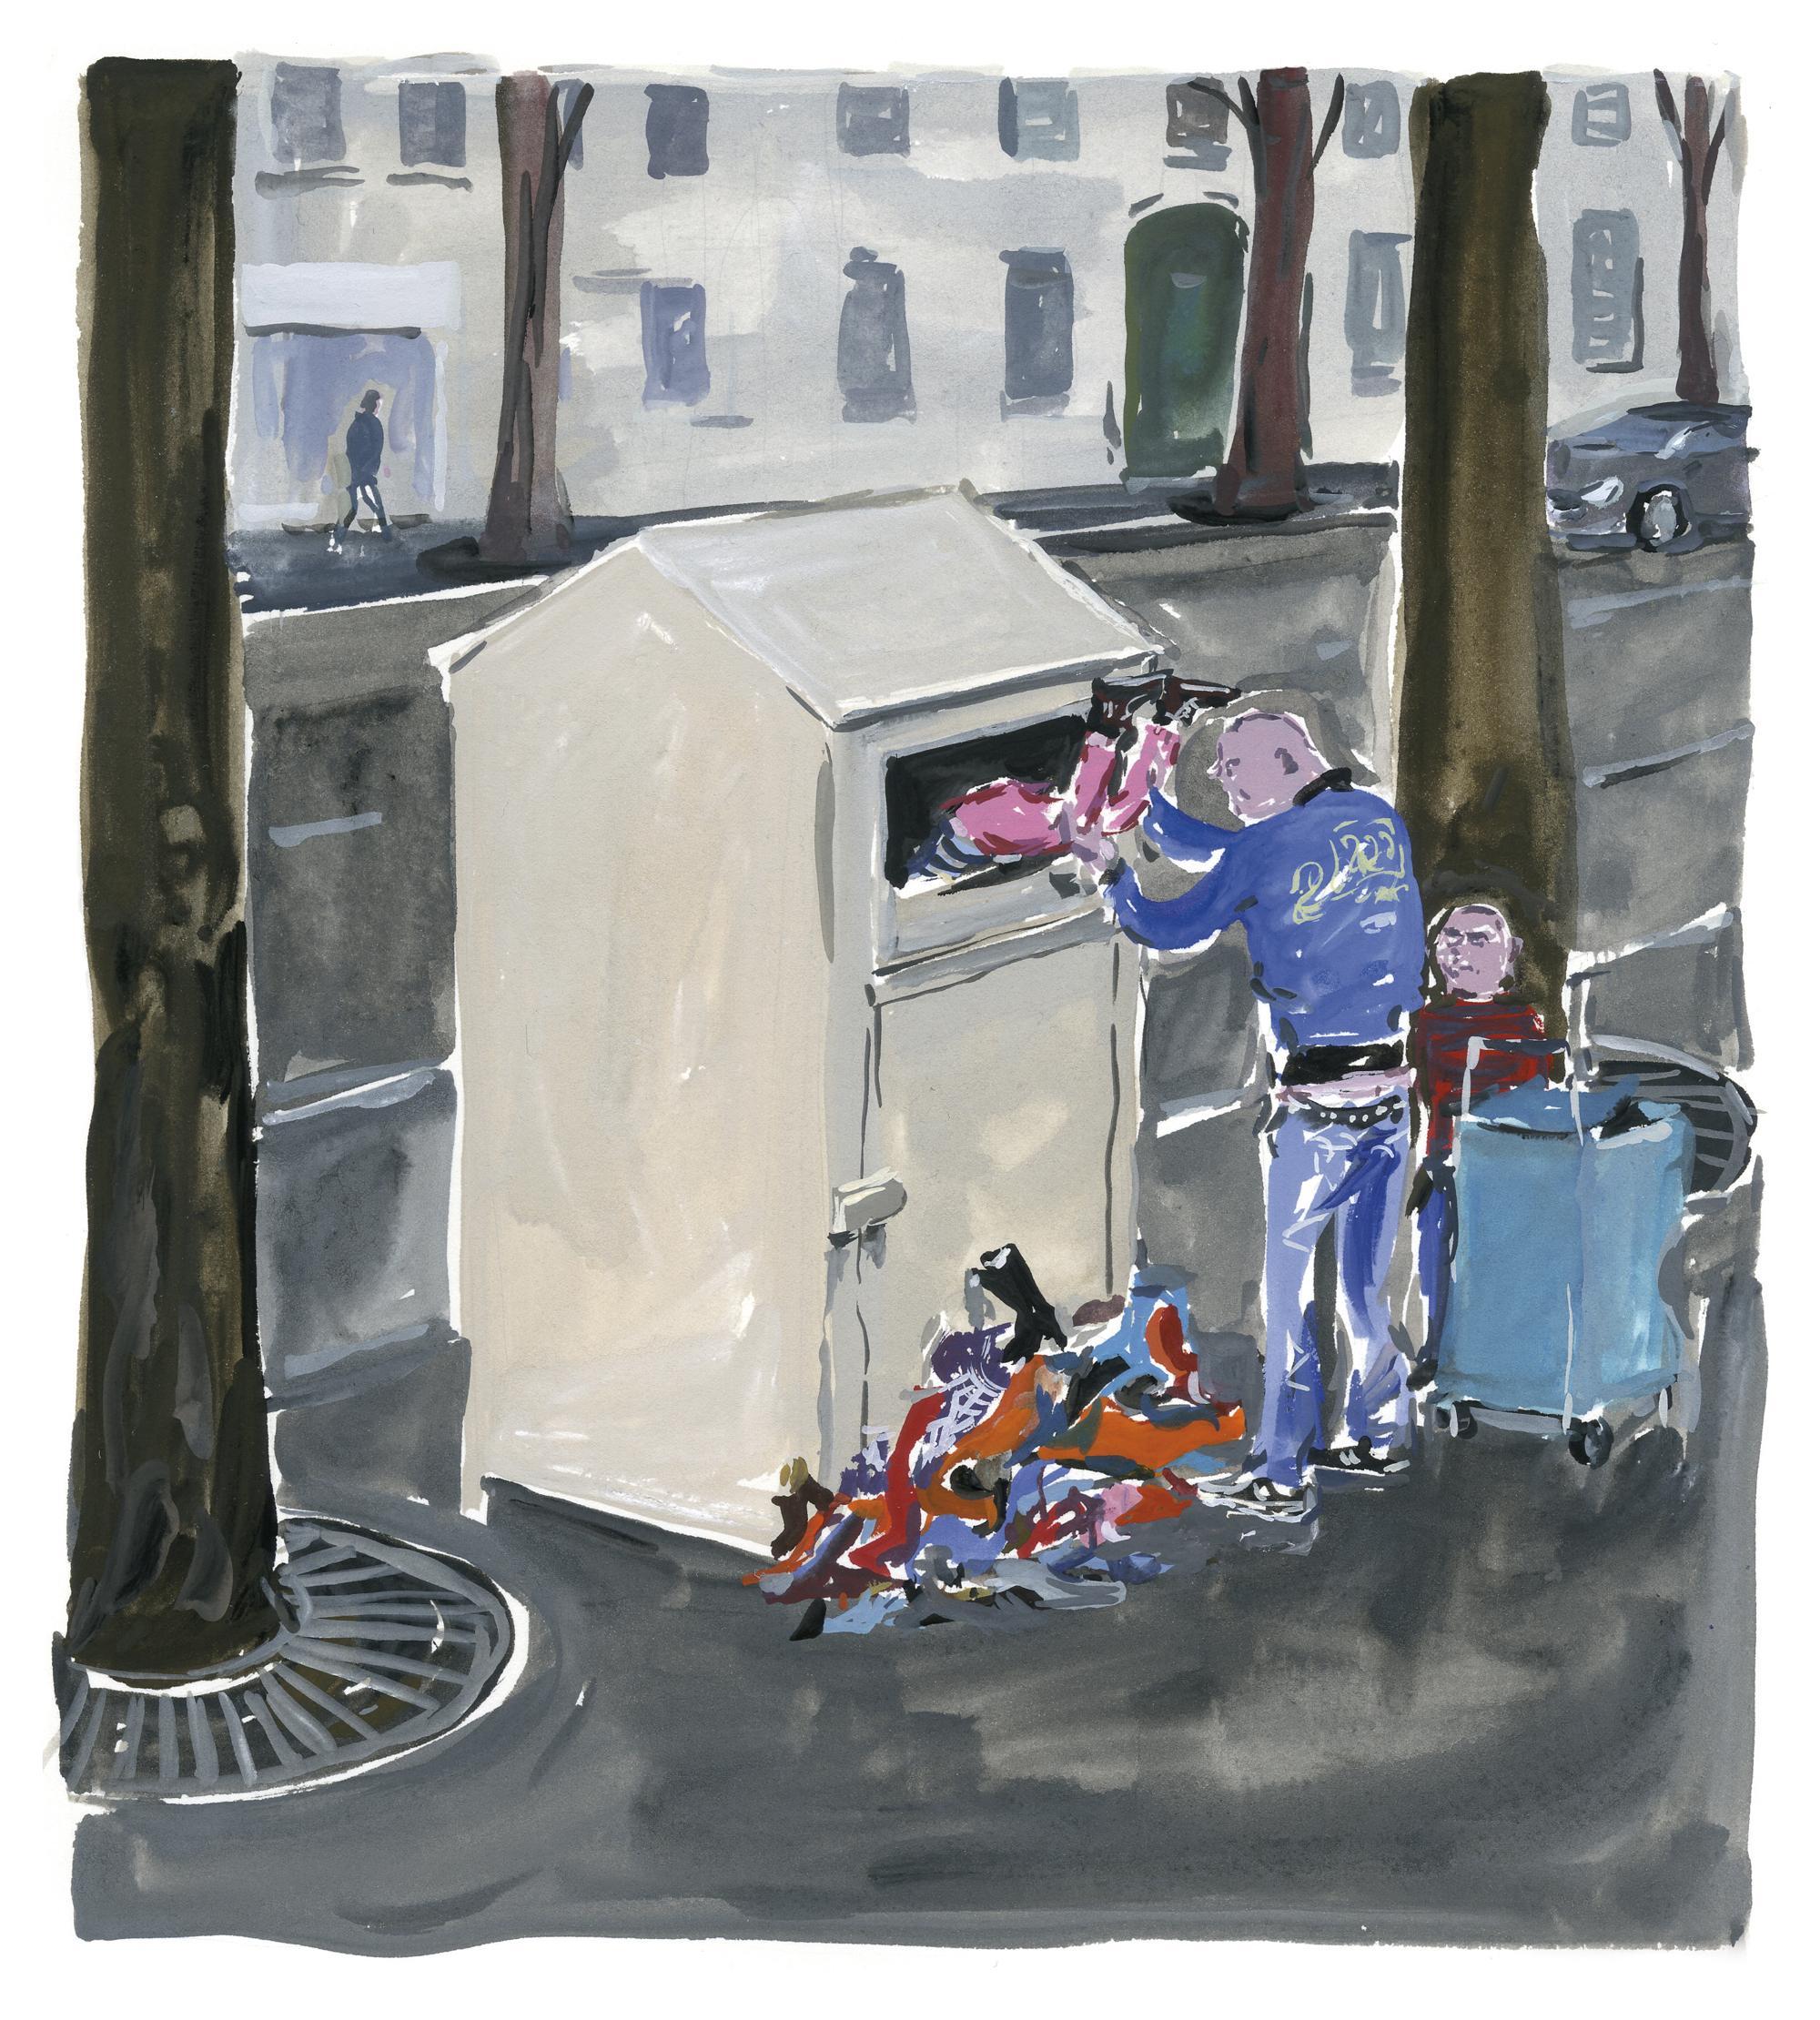 Pariser Tagebuch: Recycling